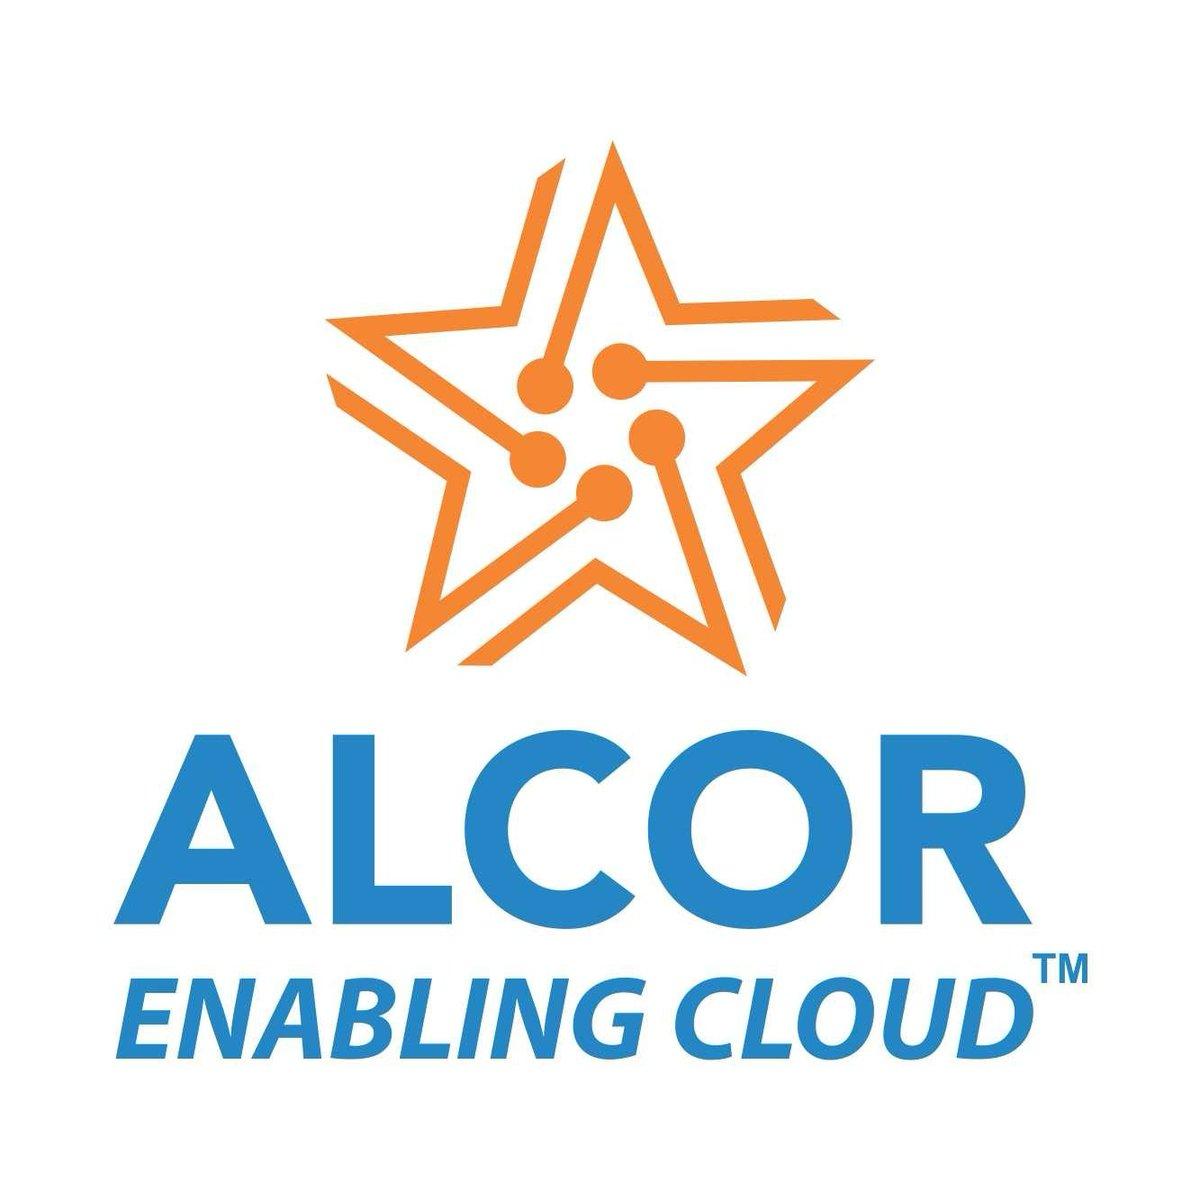 Alcor Announces a Strategic Partnership with PeopleReign - the leading AI platform for enterprise service management automation. prn.to/3ejsu25